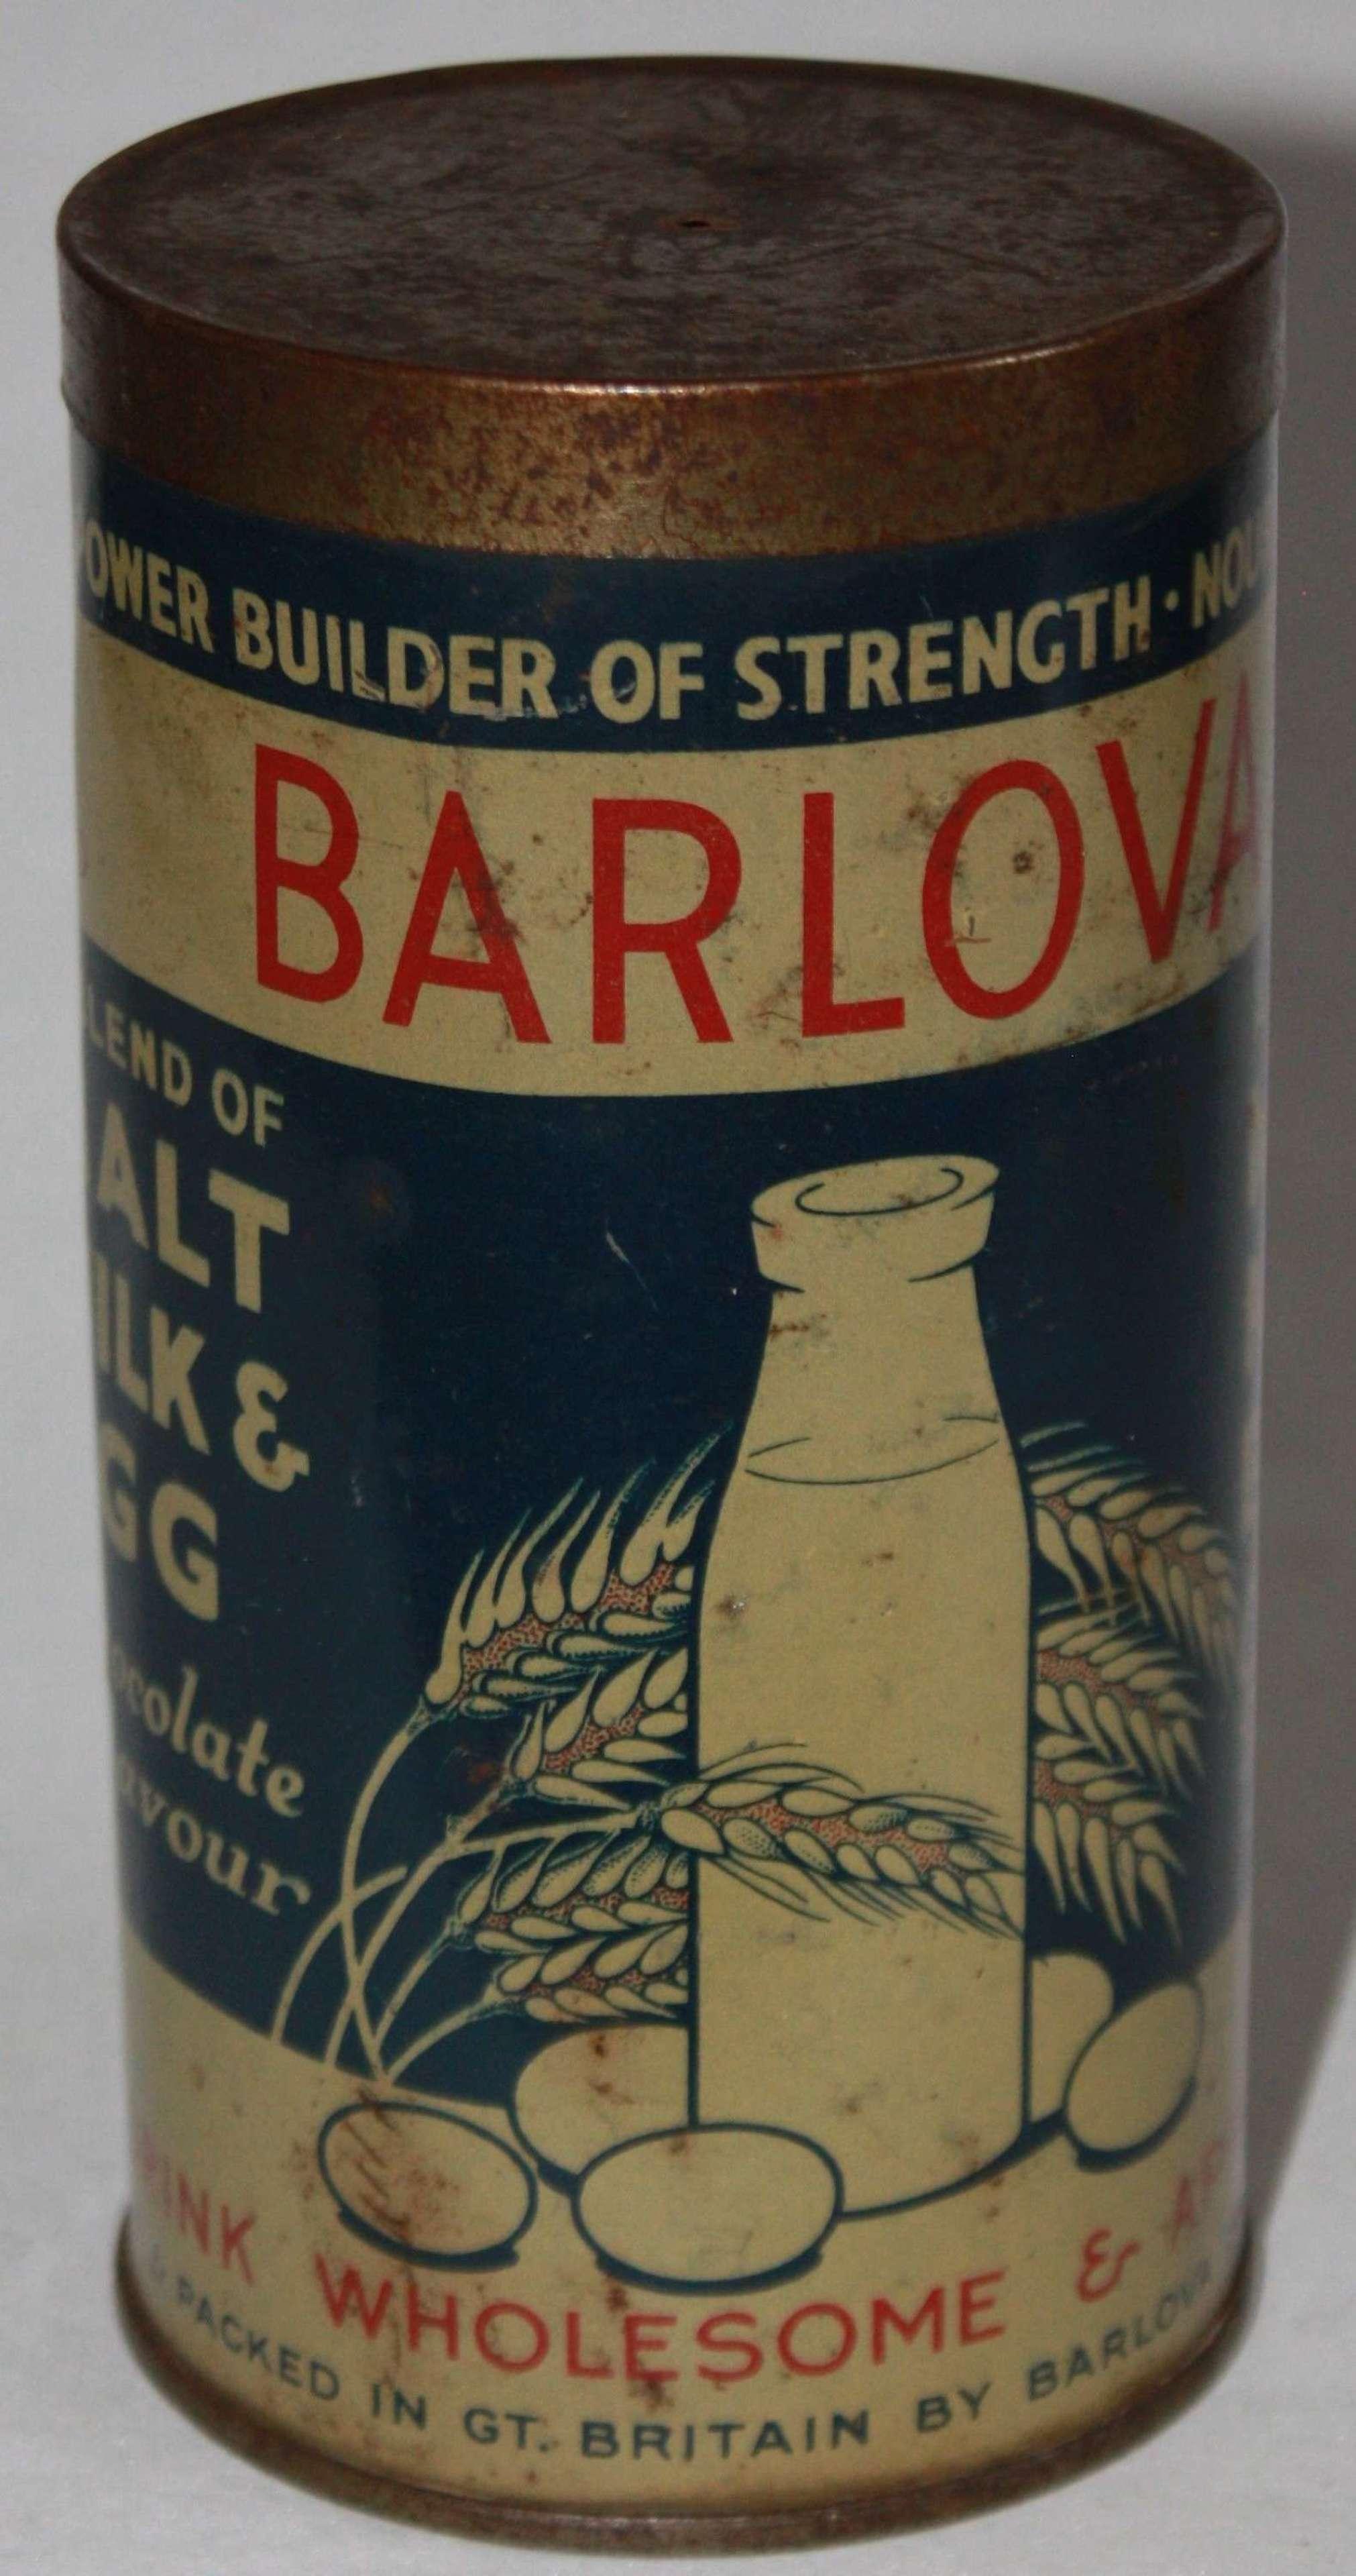 A VERY GOOD WWII HOME FRONT BARLOVA MALT MILK AND EEGS DRINK